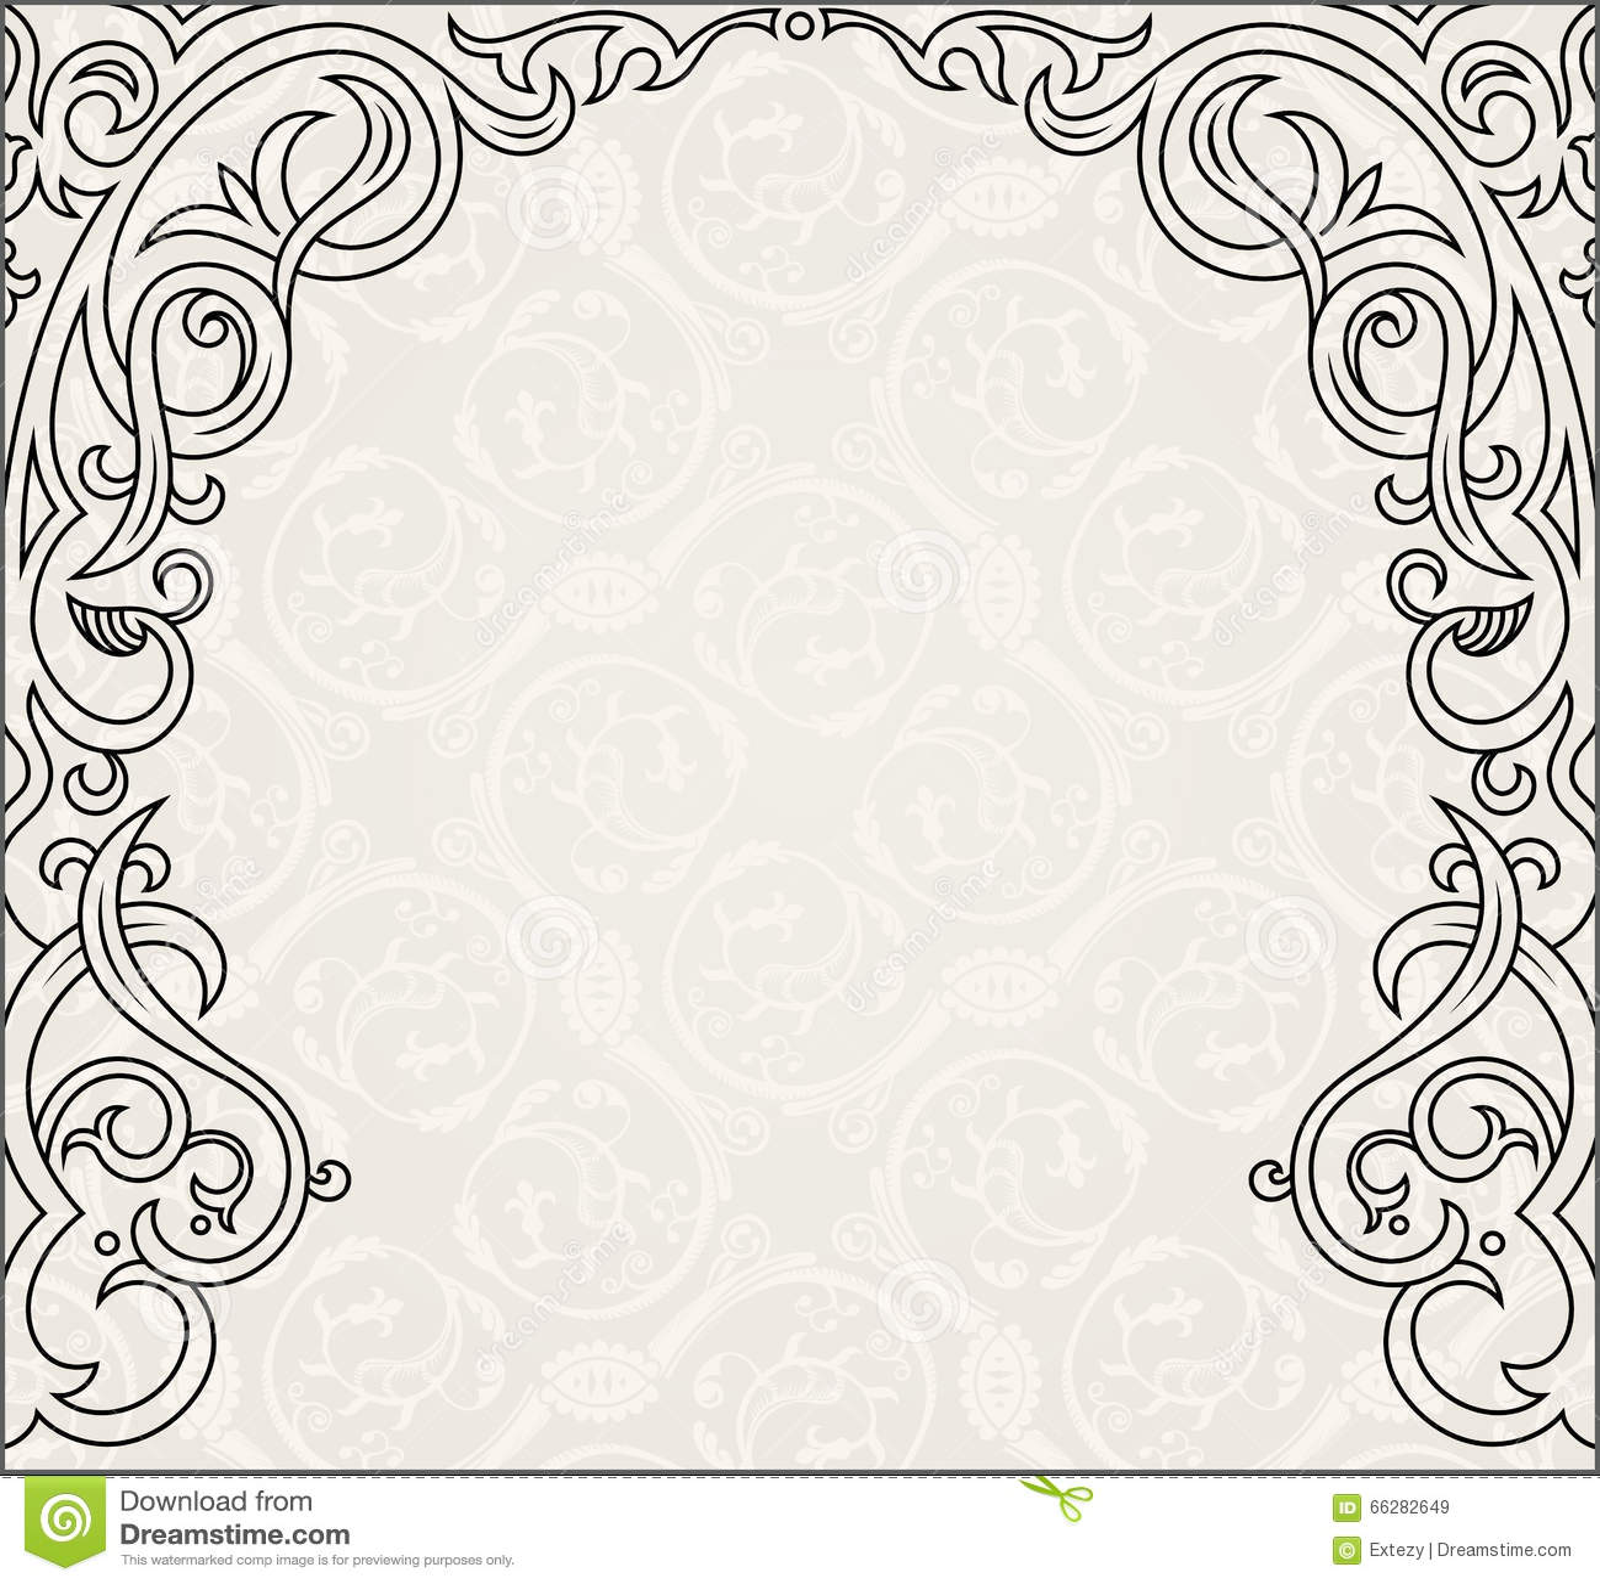 Arabic greeting vector background arch muslim mosque stock vector arabic greeting vector background arch muslim mosque m4hsunfo